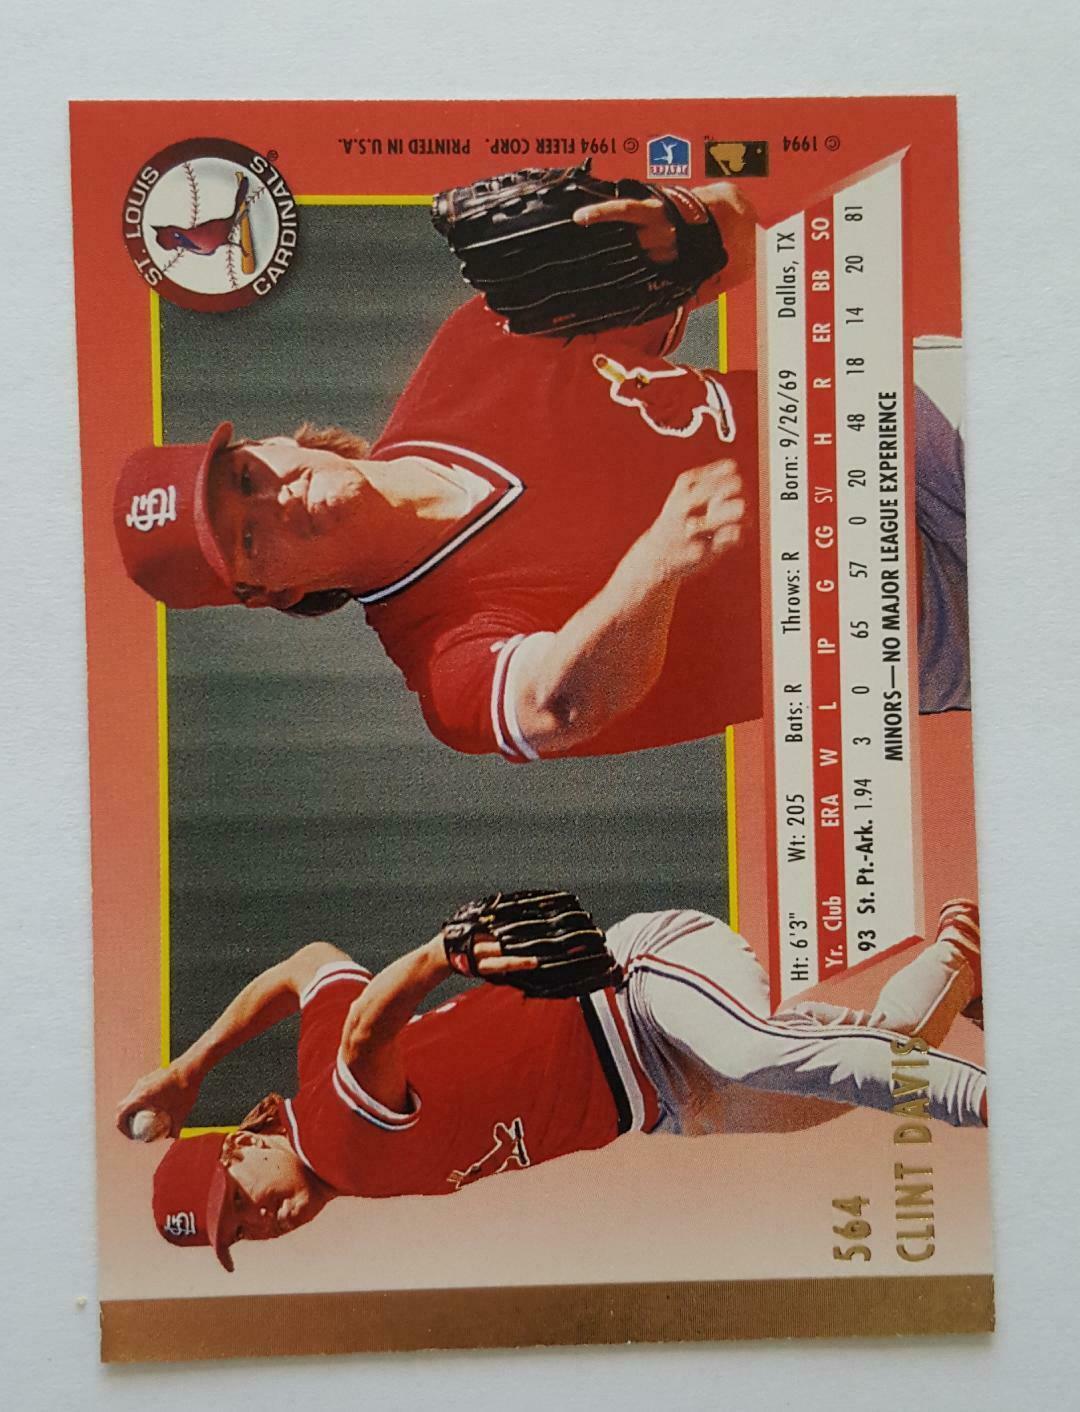 1994 Fleer Ultra + Rookie Card Lot NM Cond w/ Pat Ripp, Clint Davis, Nice Cards image 9